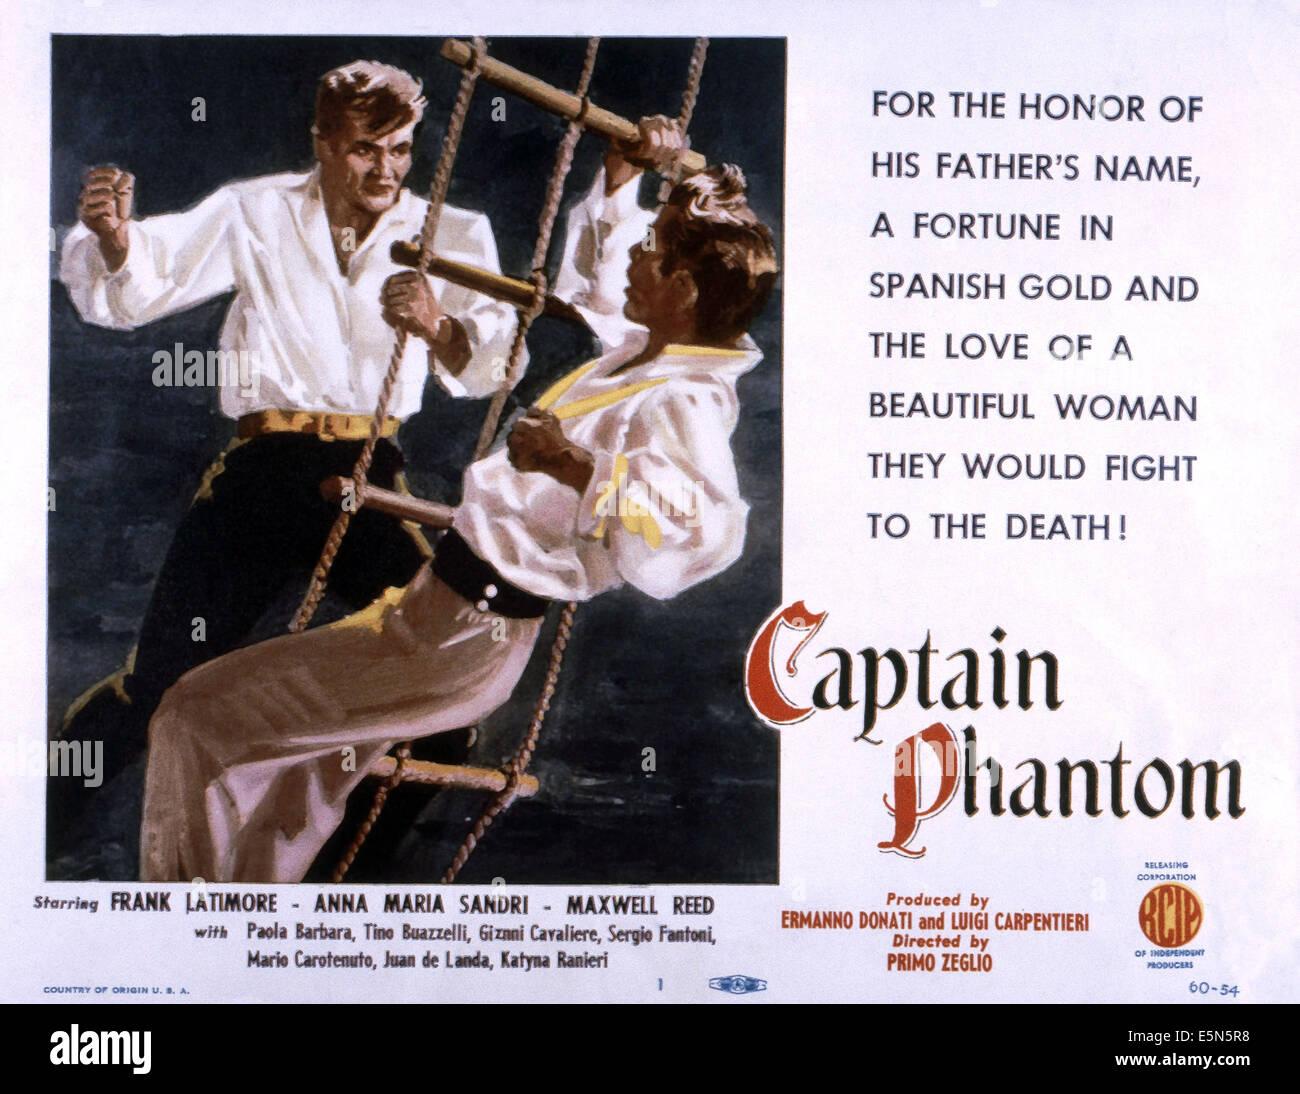 Il capitano PHANTOM, (aka CAPITAN FANTASMA), da sinistra: Frank Latimore, Maxwell Reed, 1953 Immagini Stock